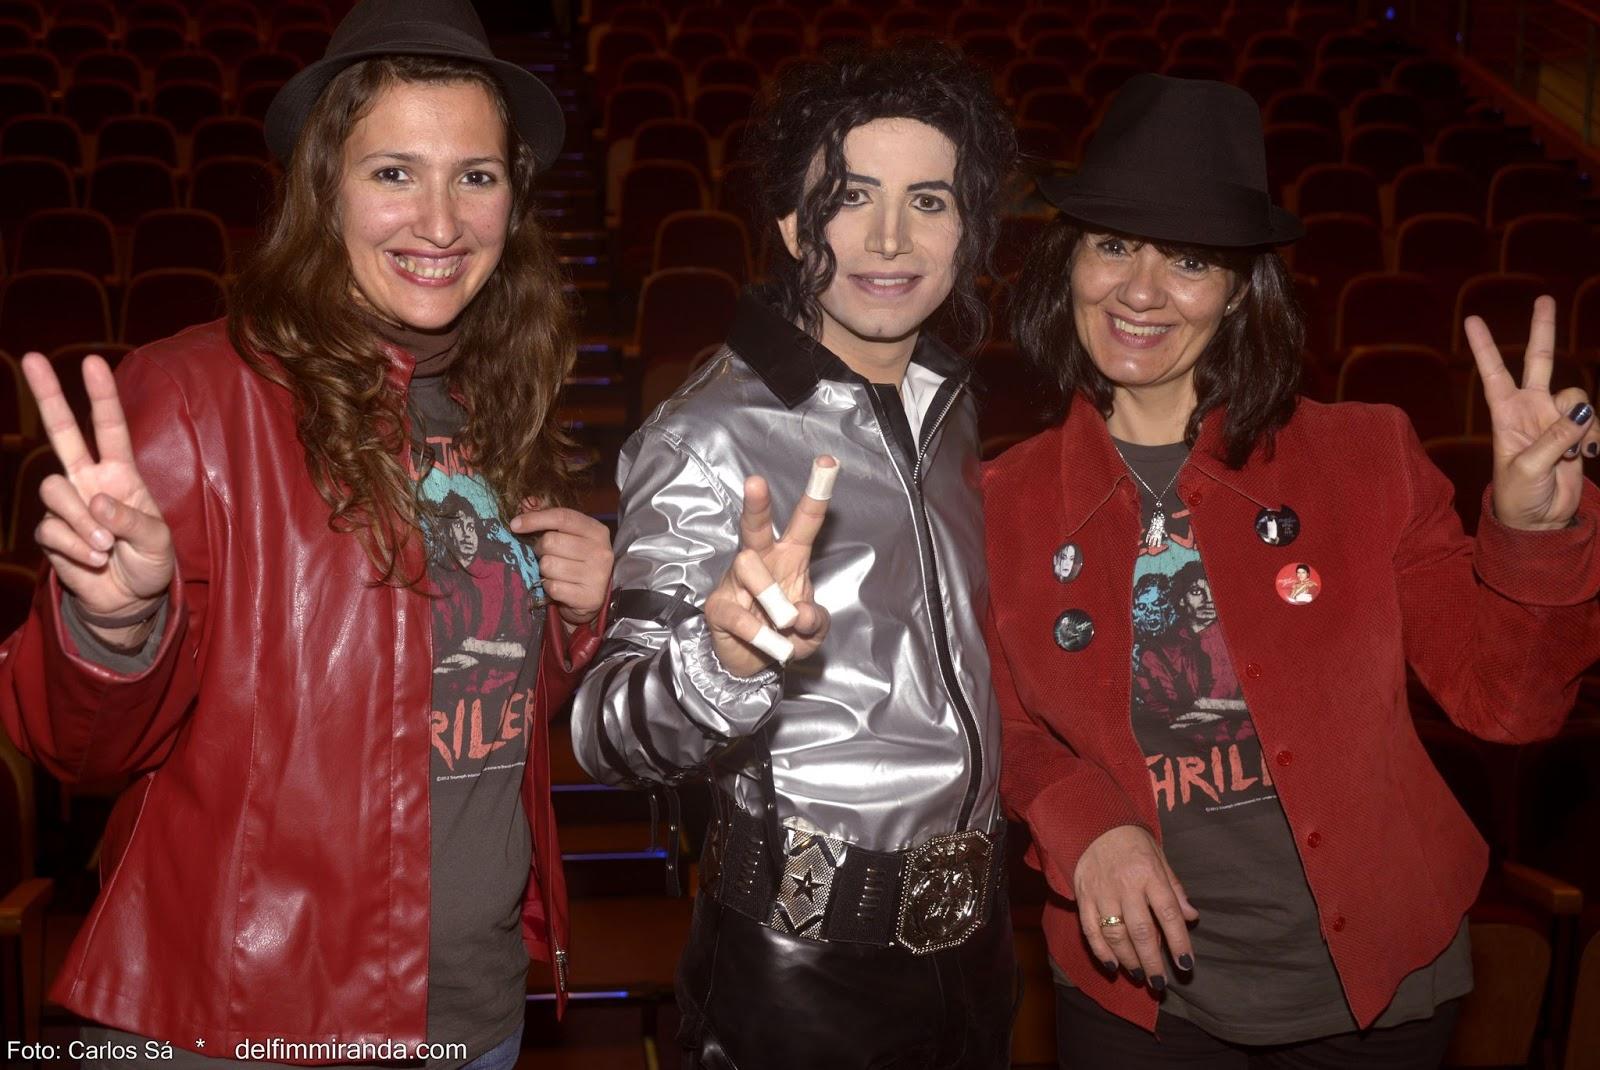 Delfim Miranda - Michael Jackson Tribute - After the show with M.J. fans